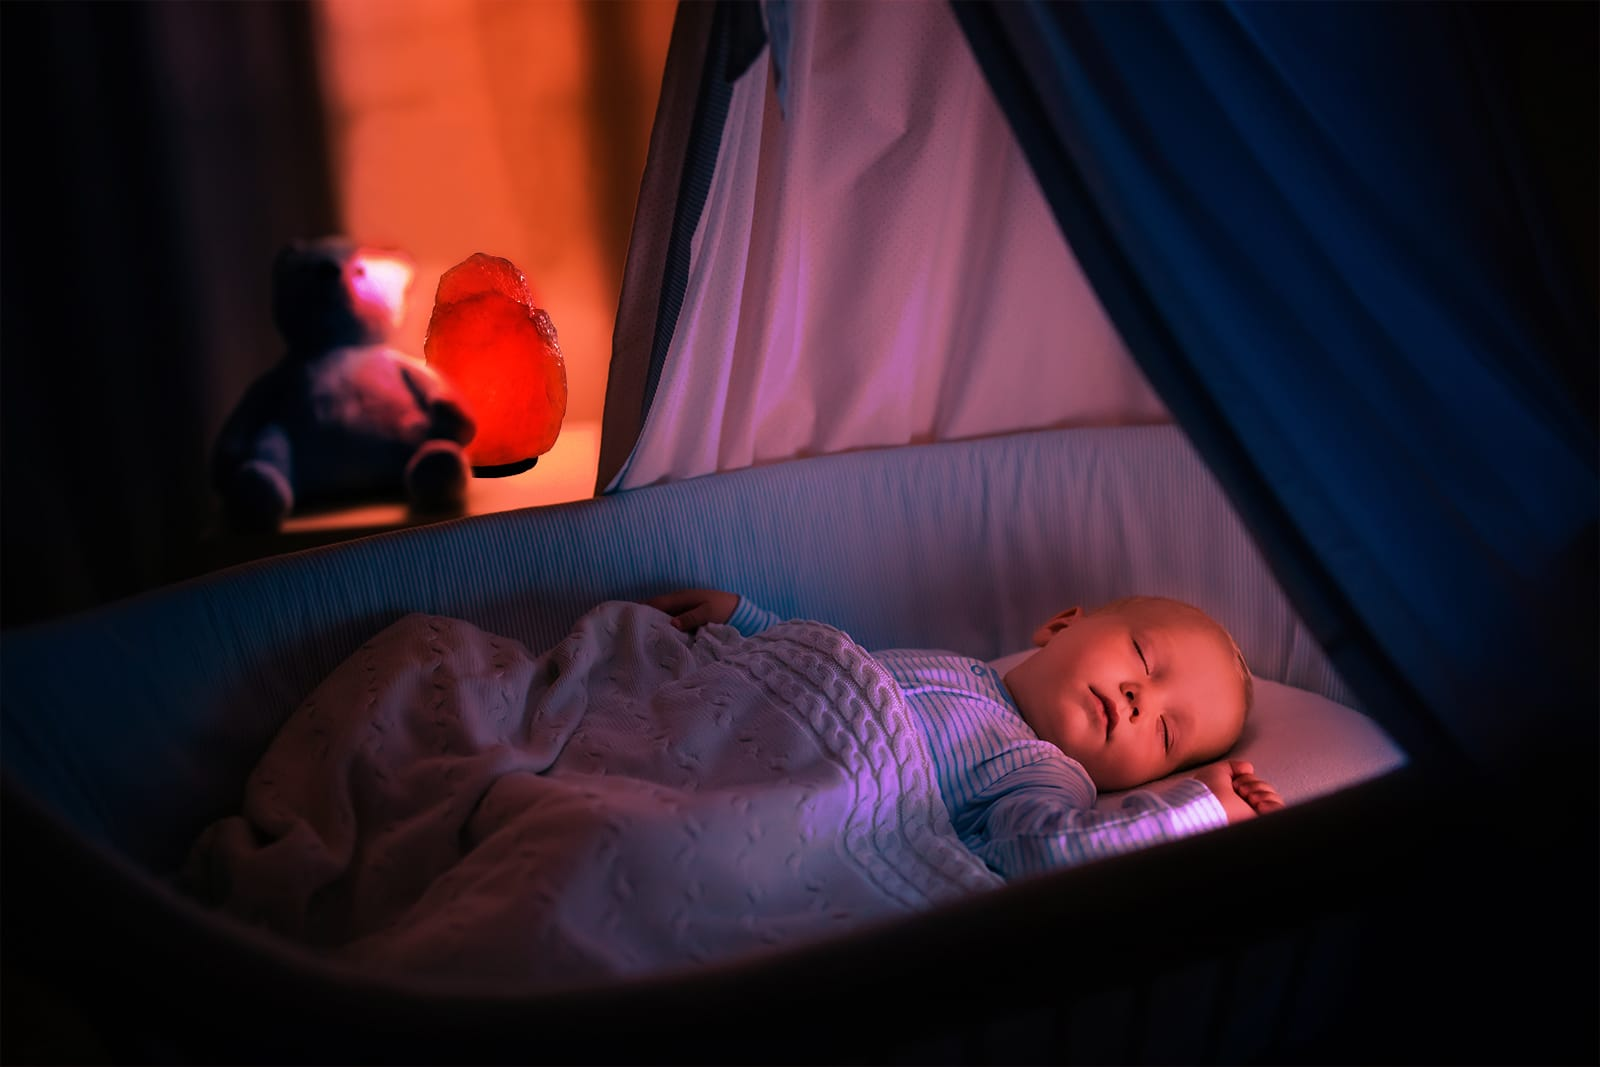 luce rossa sonno bambino